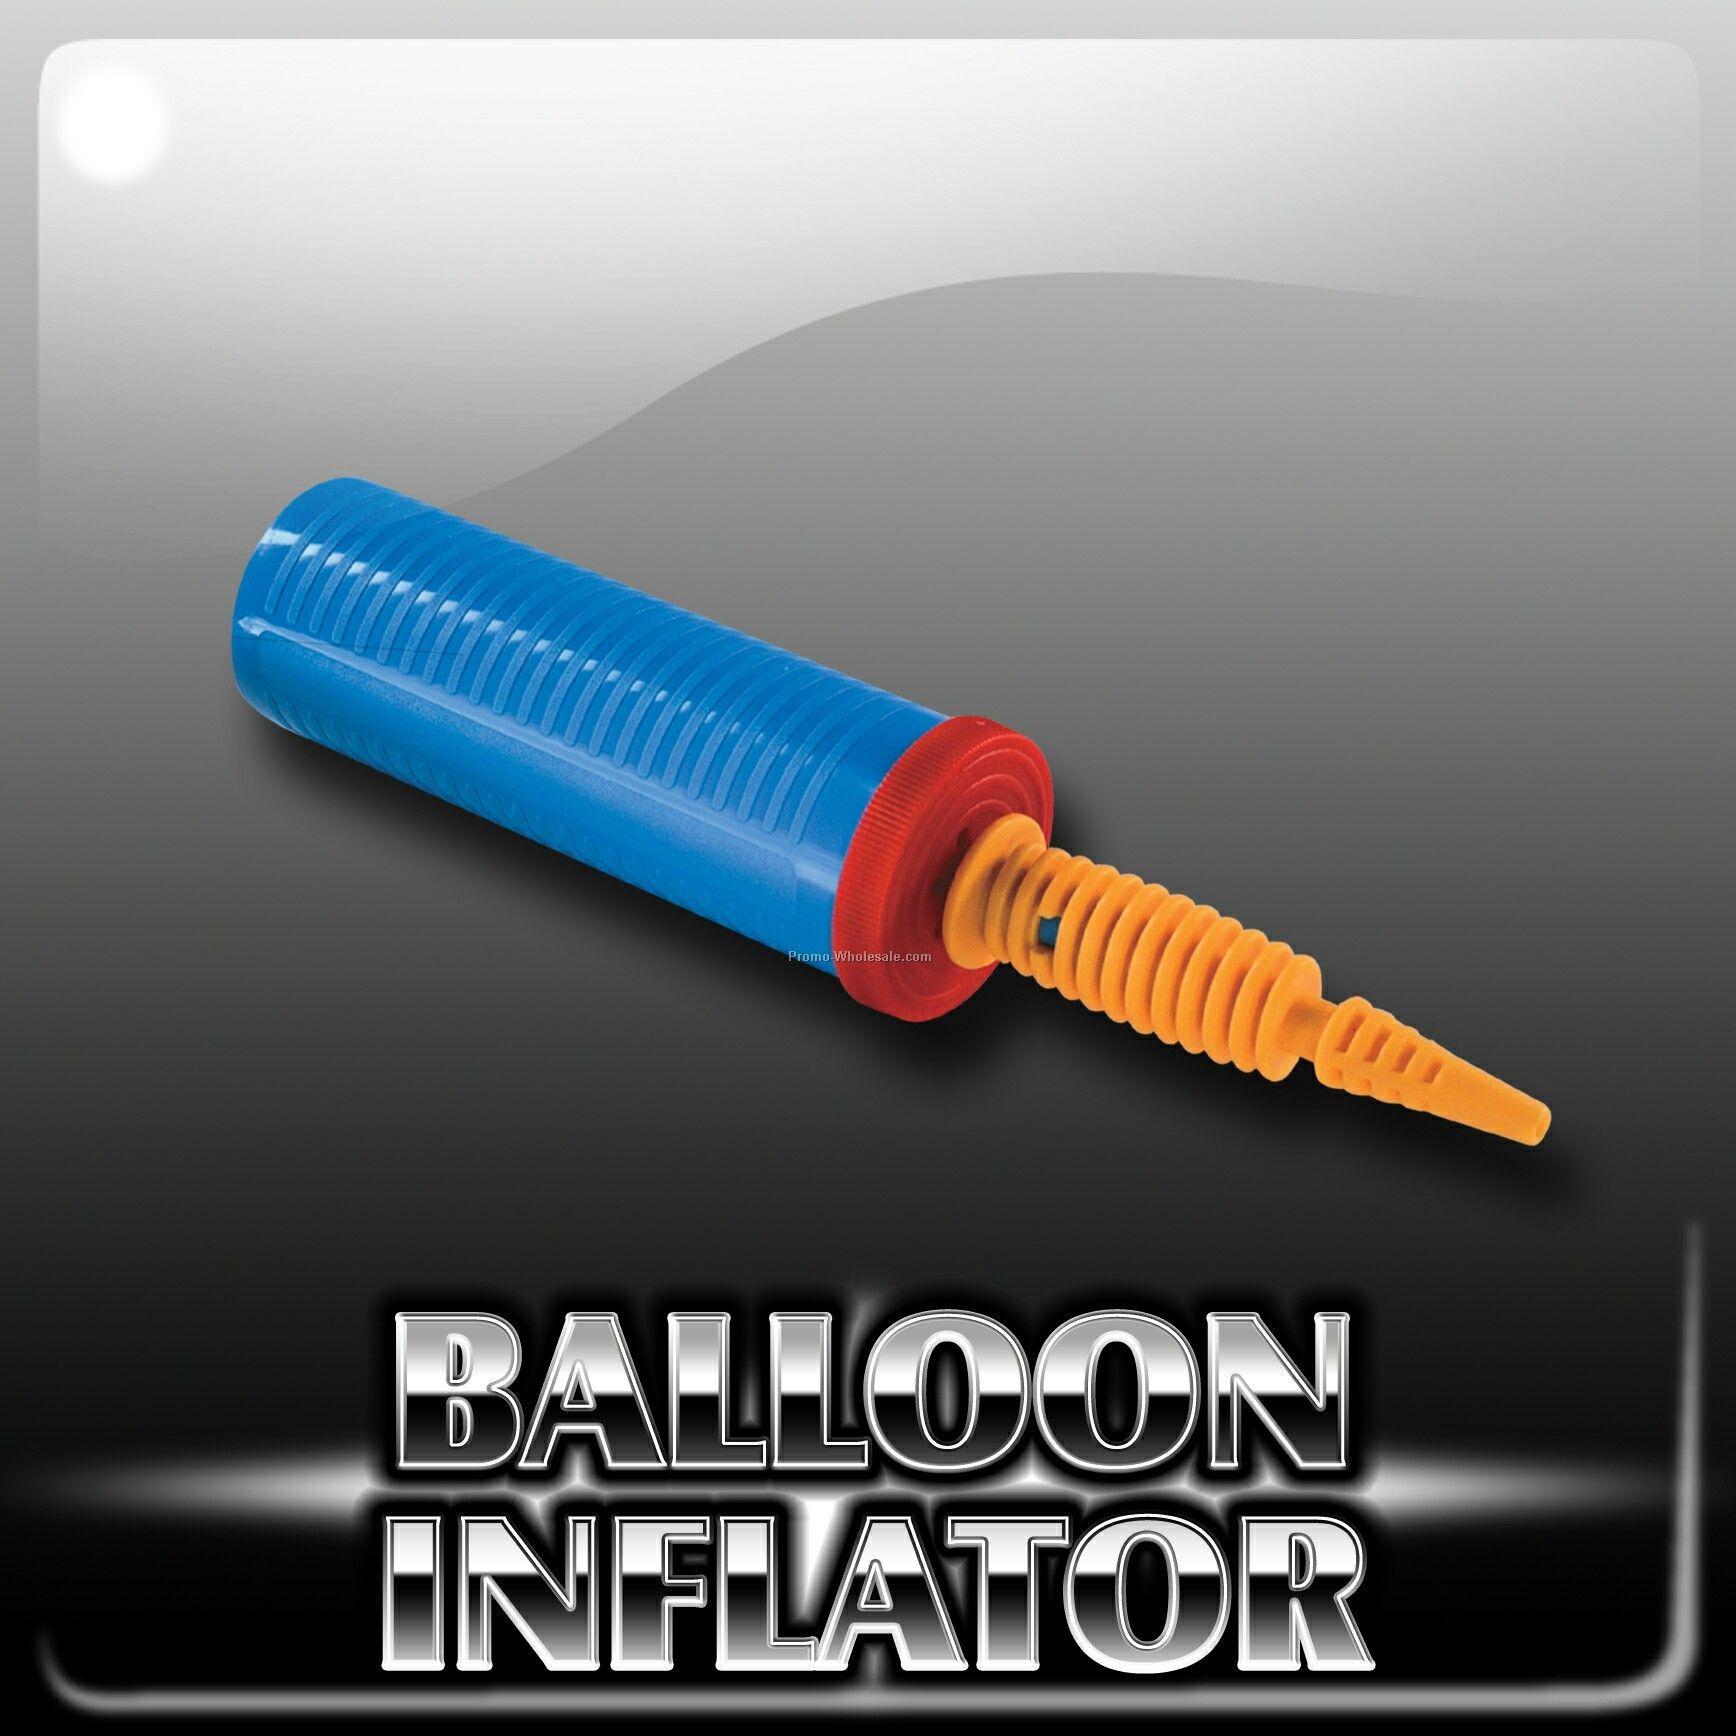 Hand-pump Balloon Inflator